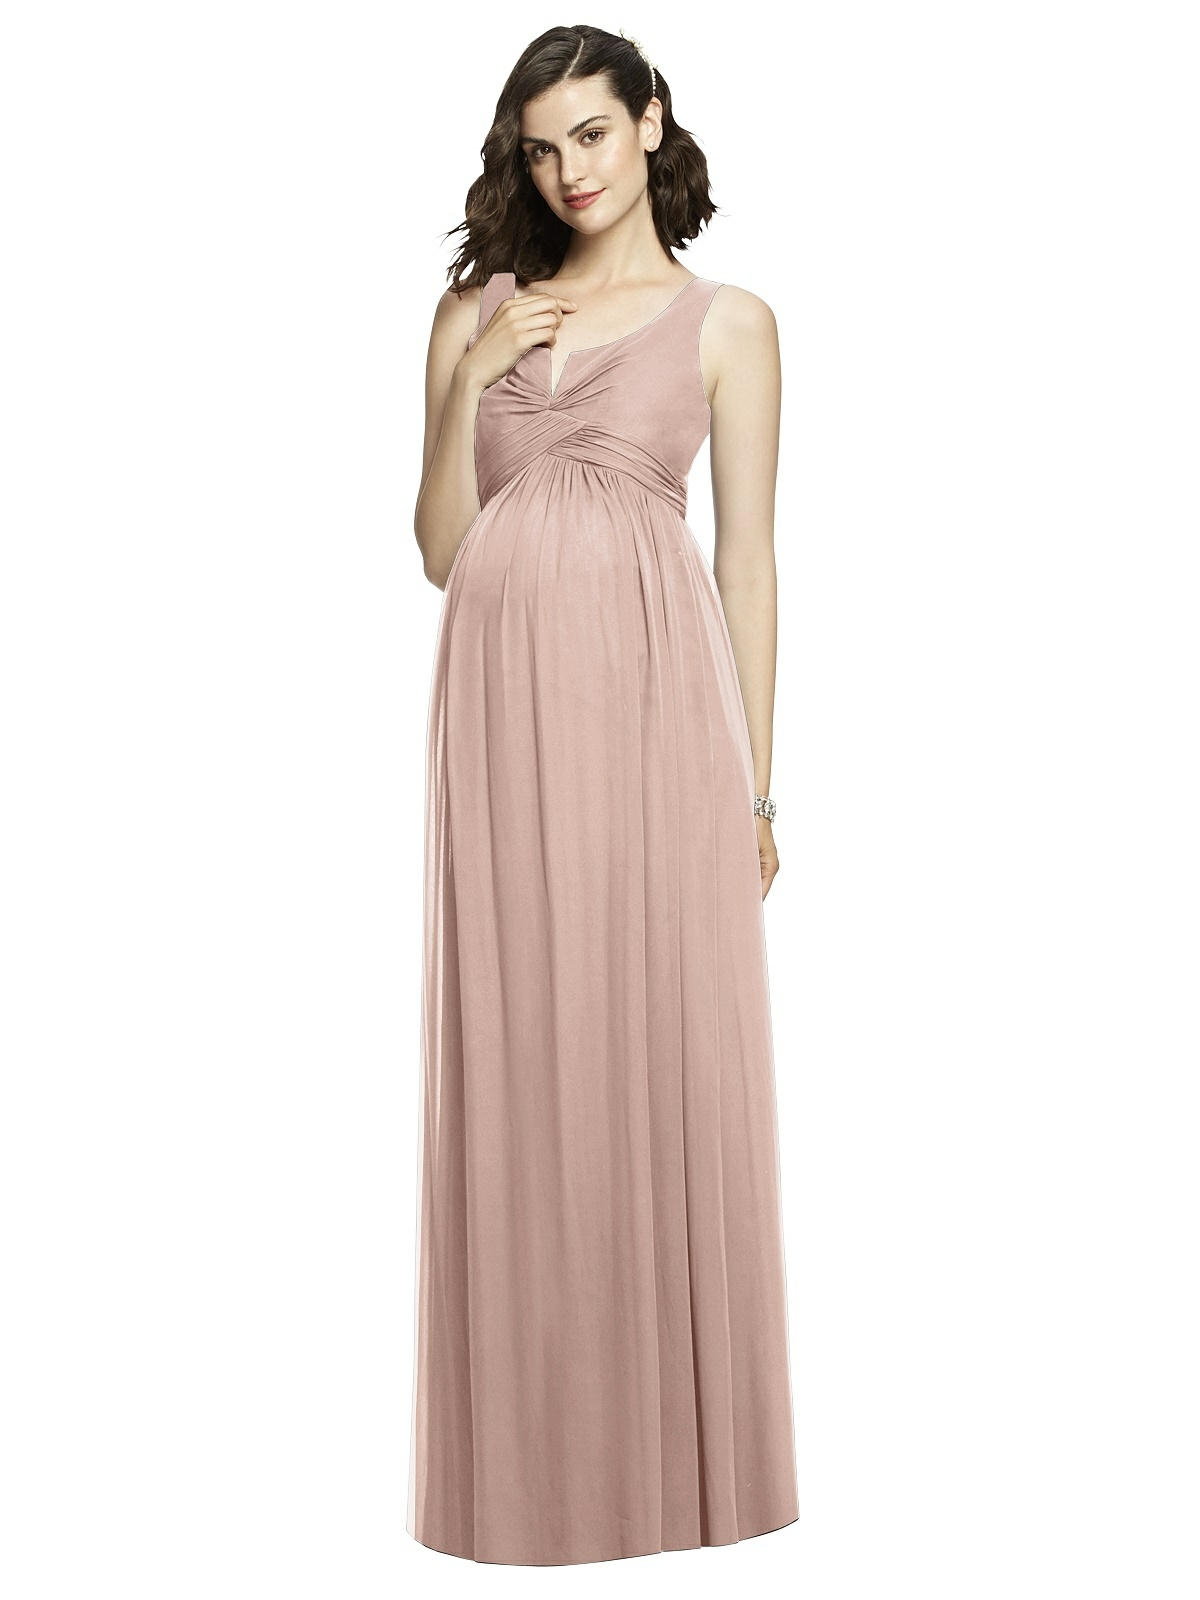 rhianna maternity bridesmaids dress dessy bliss pink